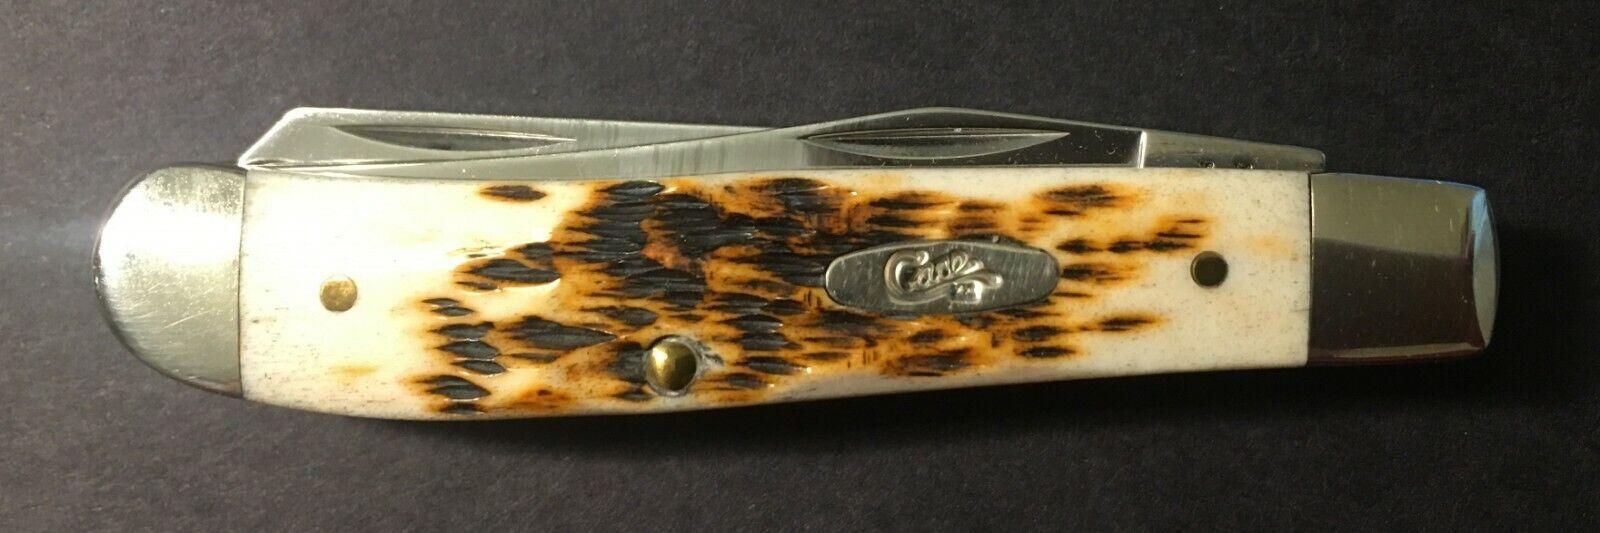 2014 Case XX 6207 Stainless Steel Mini-Trapper Amber Bone Pocket Knife